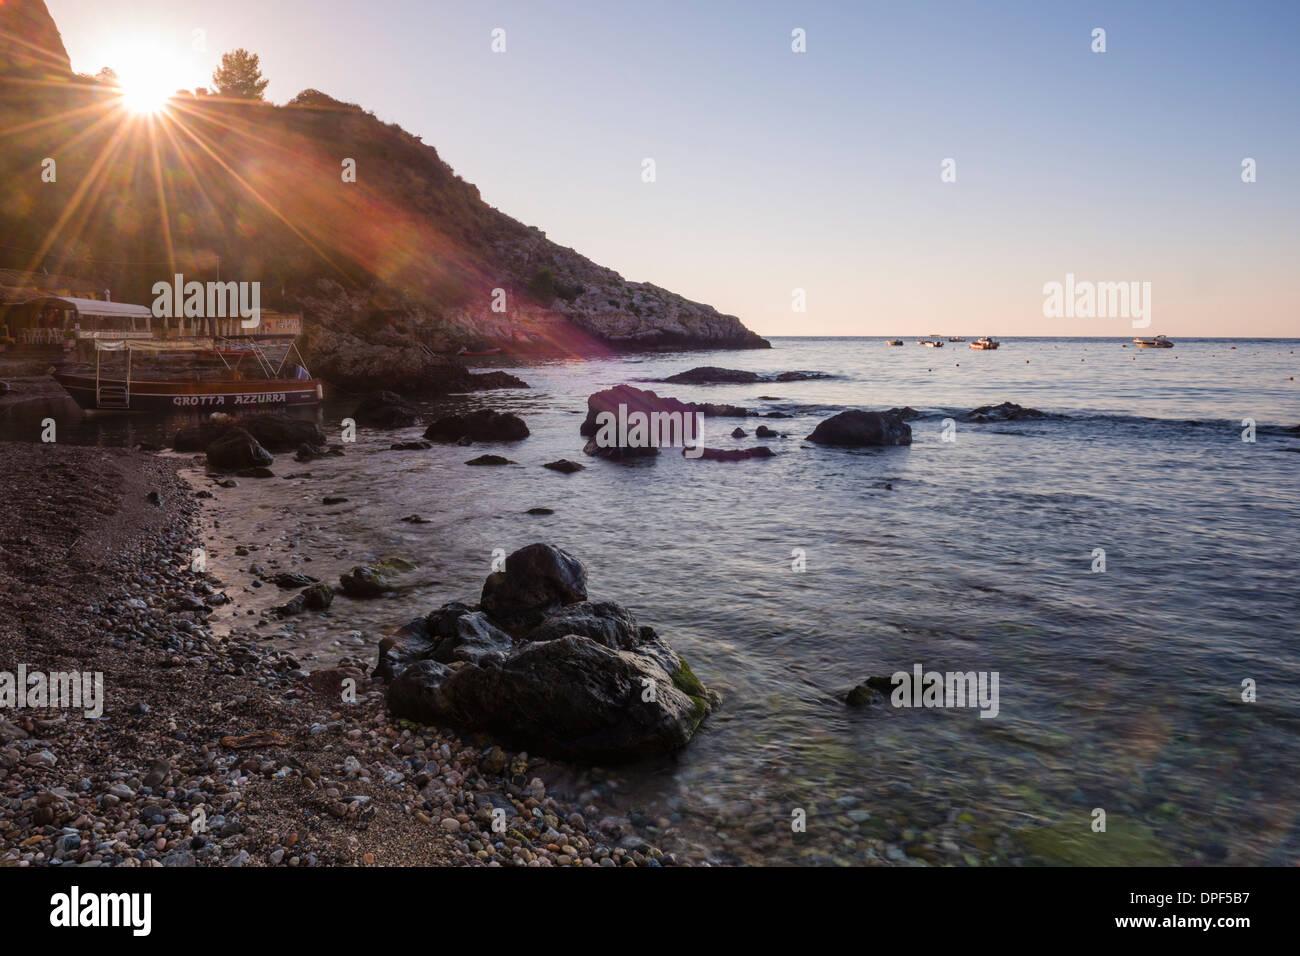 Sunstar at Isola Bella Beach at sunrise, Taormina, Sicily, Italy, Mediterranean, Europe - Stock Image